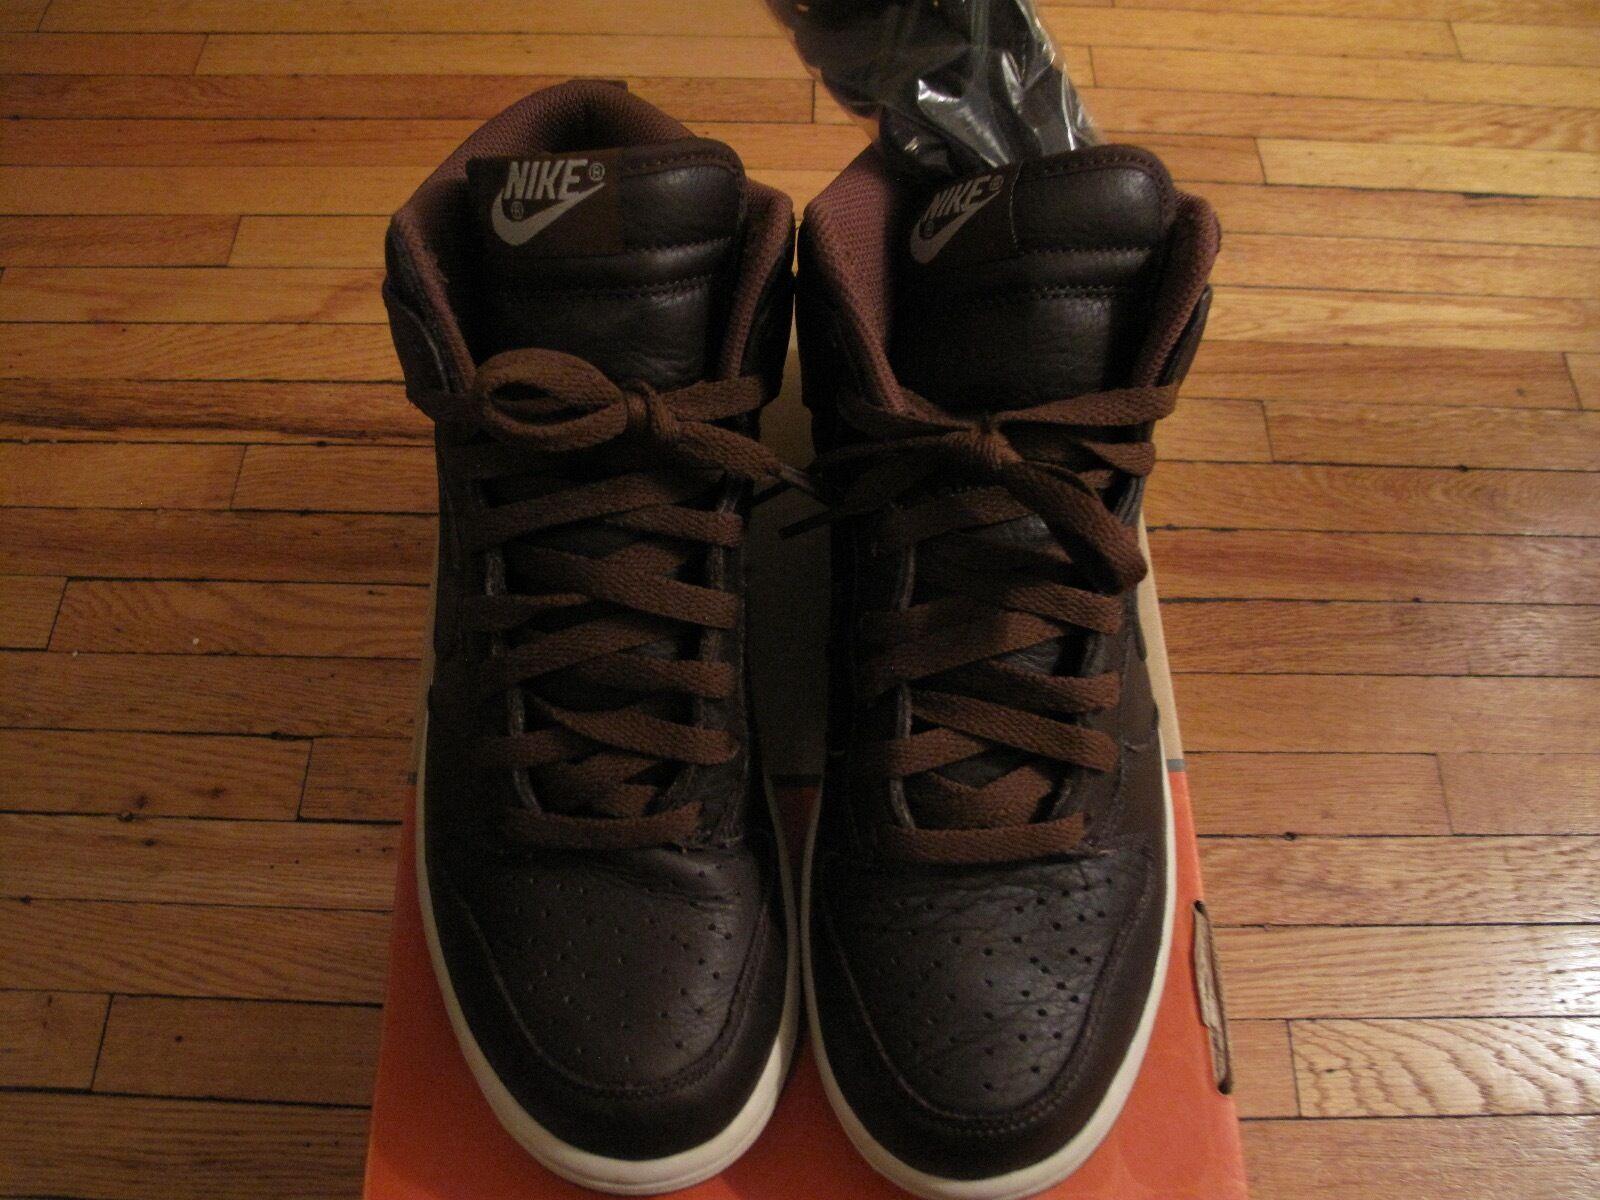 Mens Nike Dunk High Premium QS Size 8.5, Baroque Brown/Birch